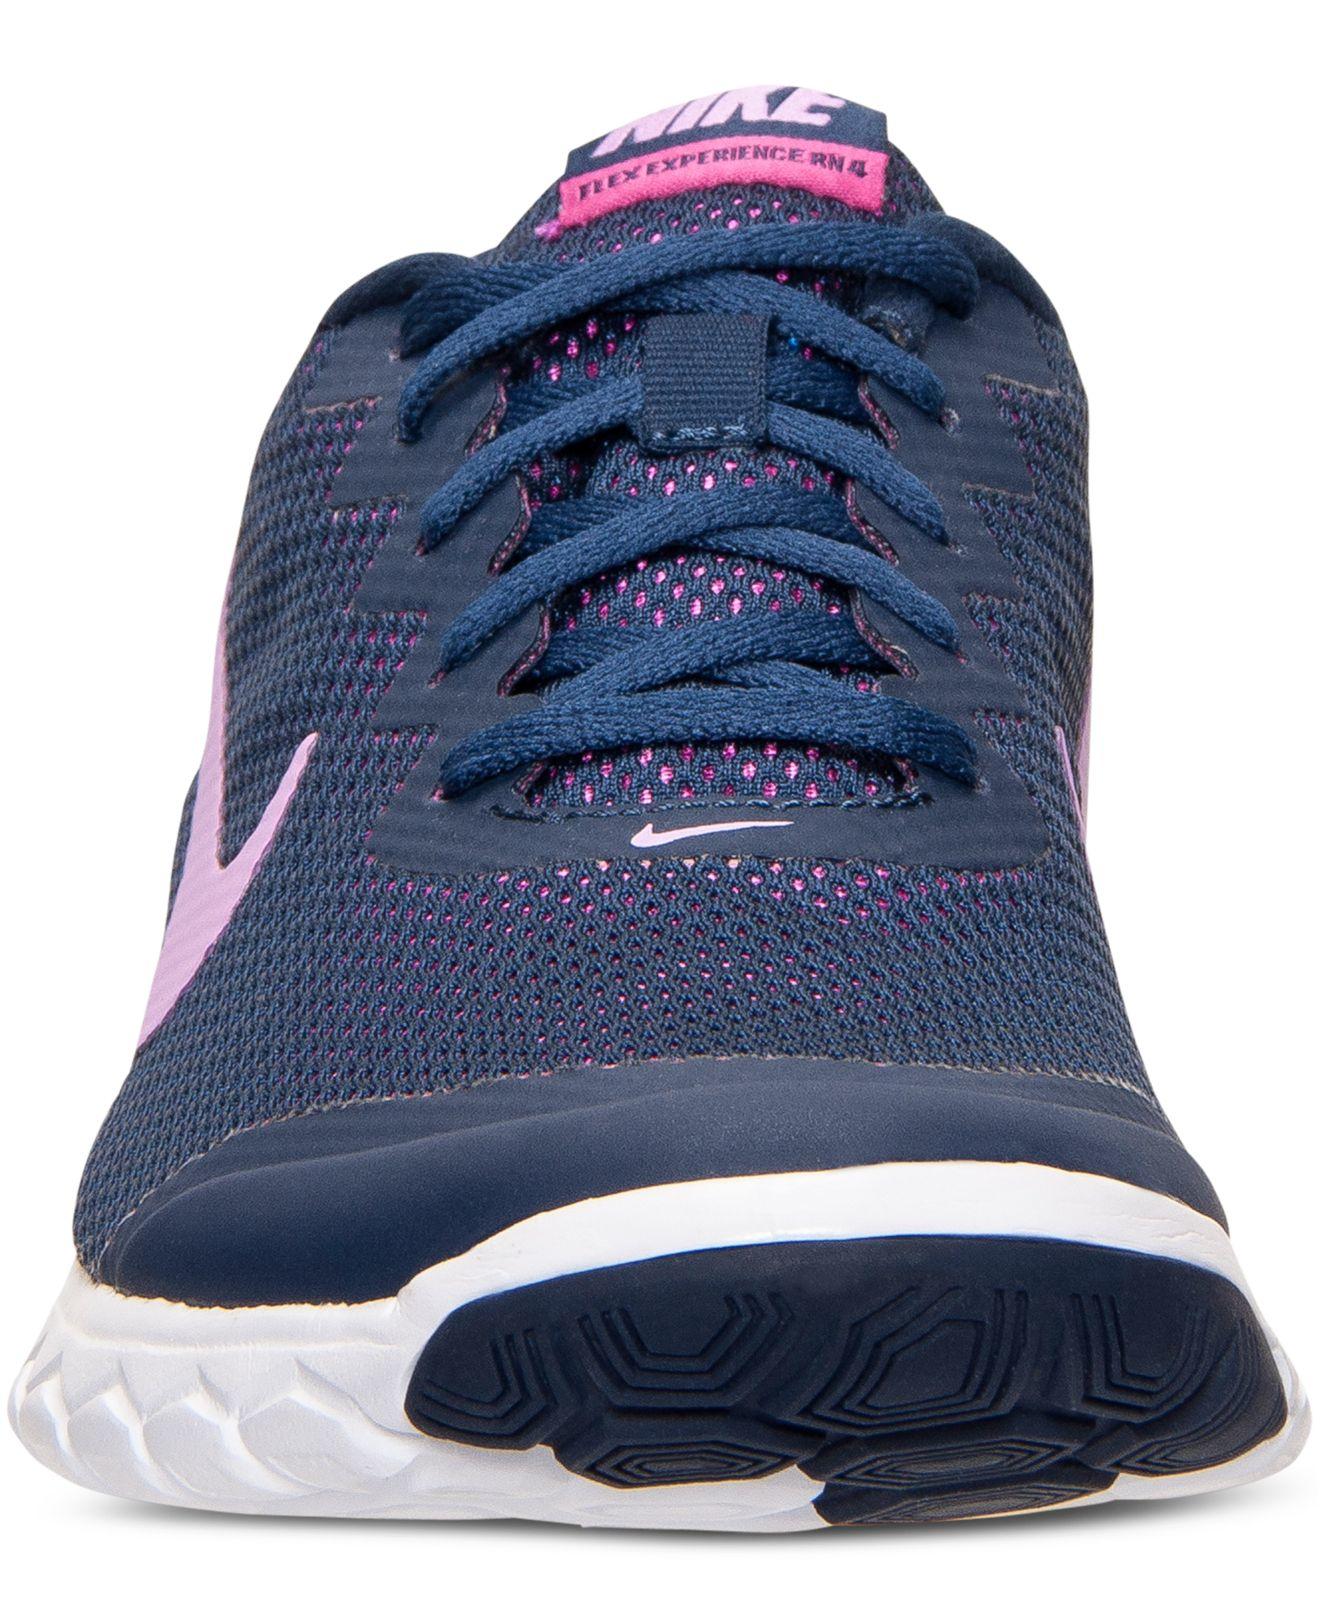 Lyst - Nike Women s Flex Experience Run 4 Running Sneakers From ... d174904848